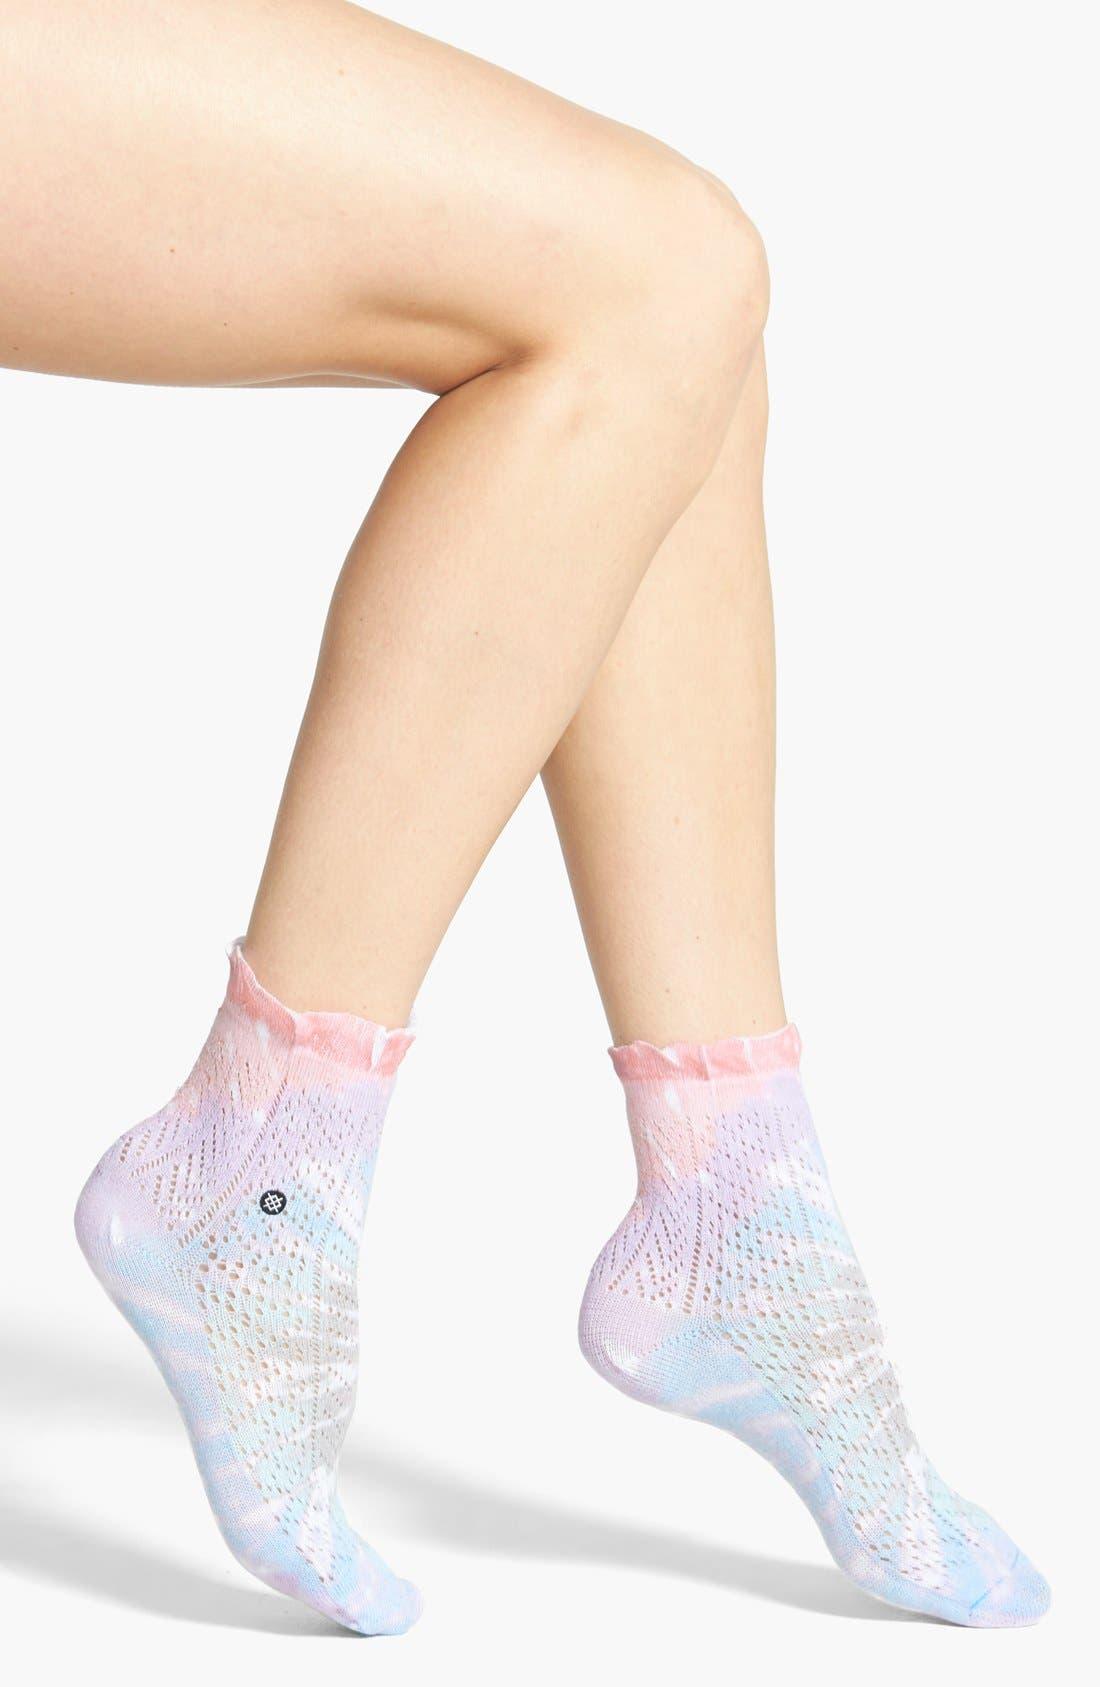 Main Image - Stance 'Chloe' Tie-Dye Ankle Socks